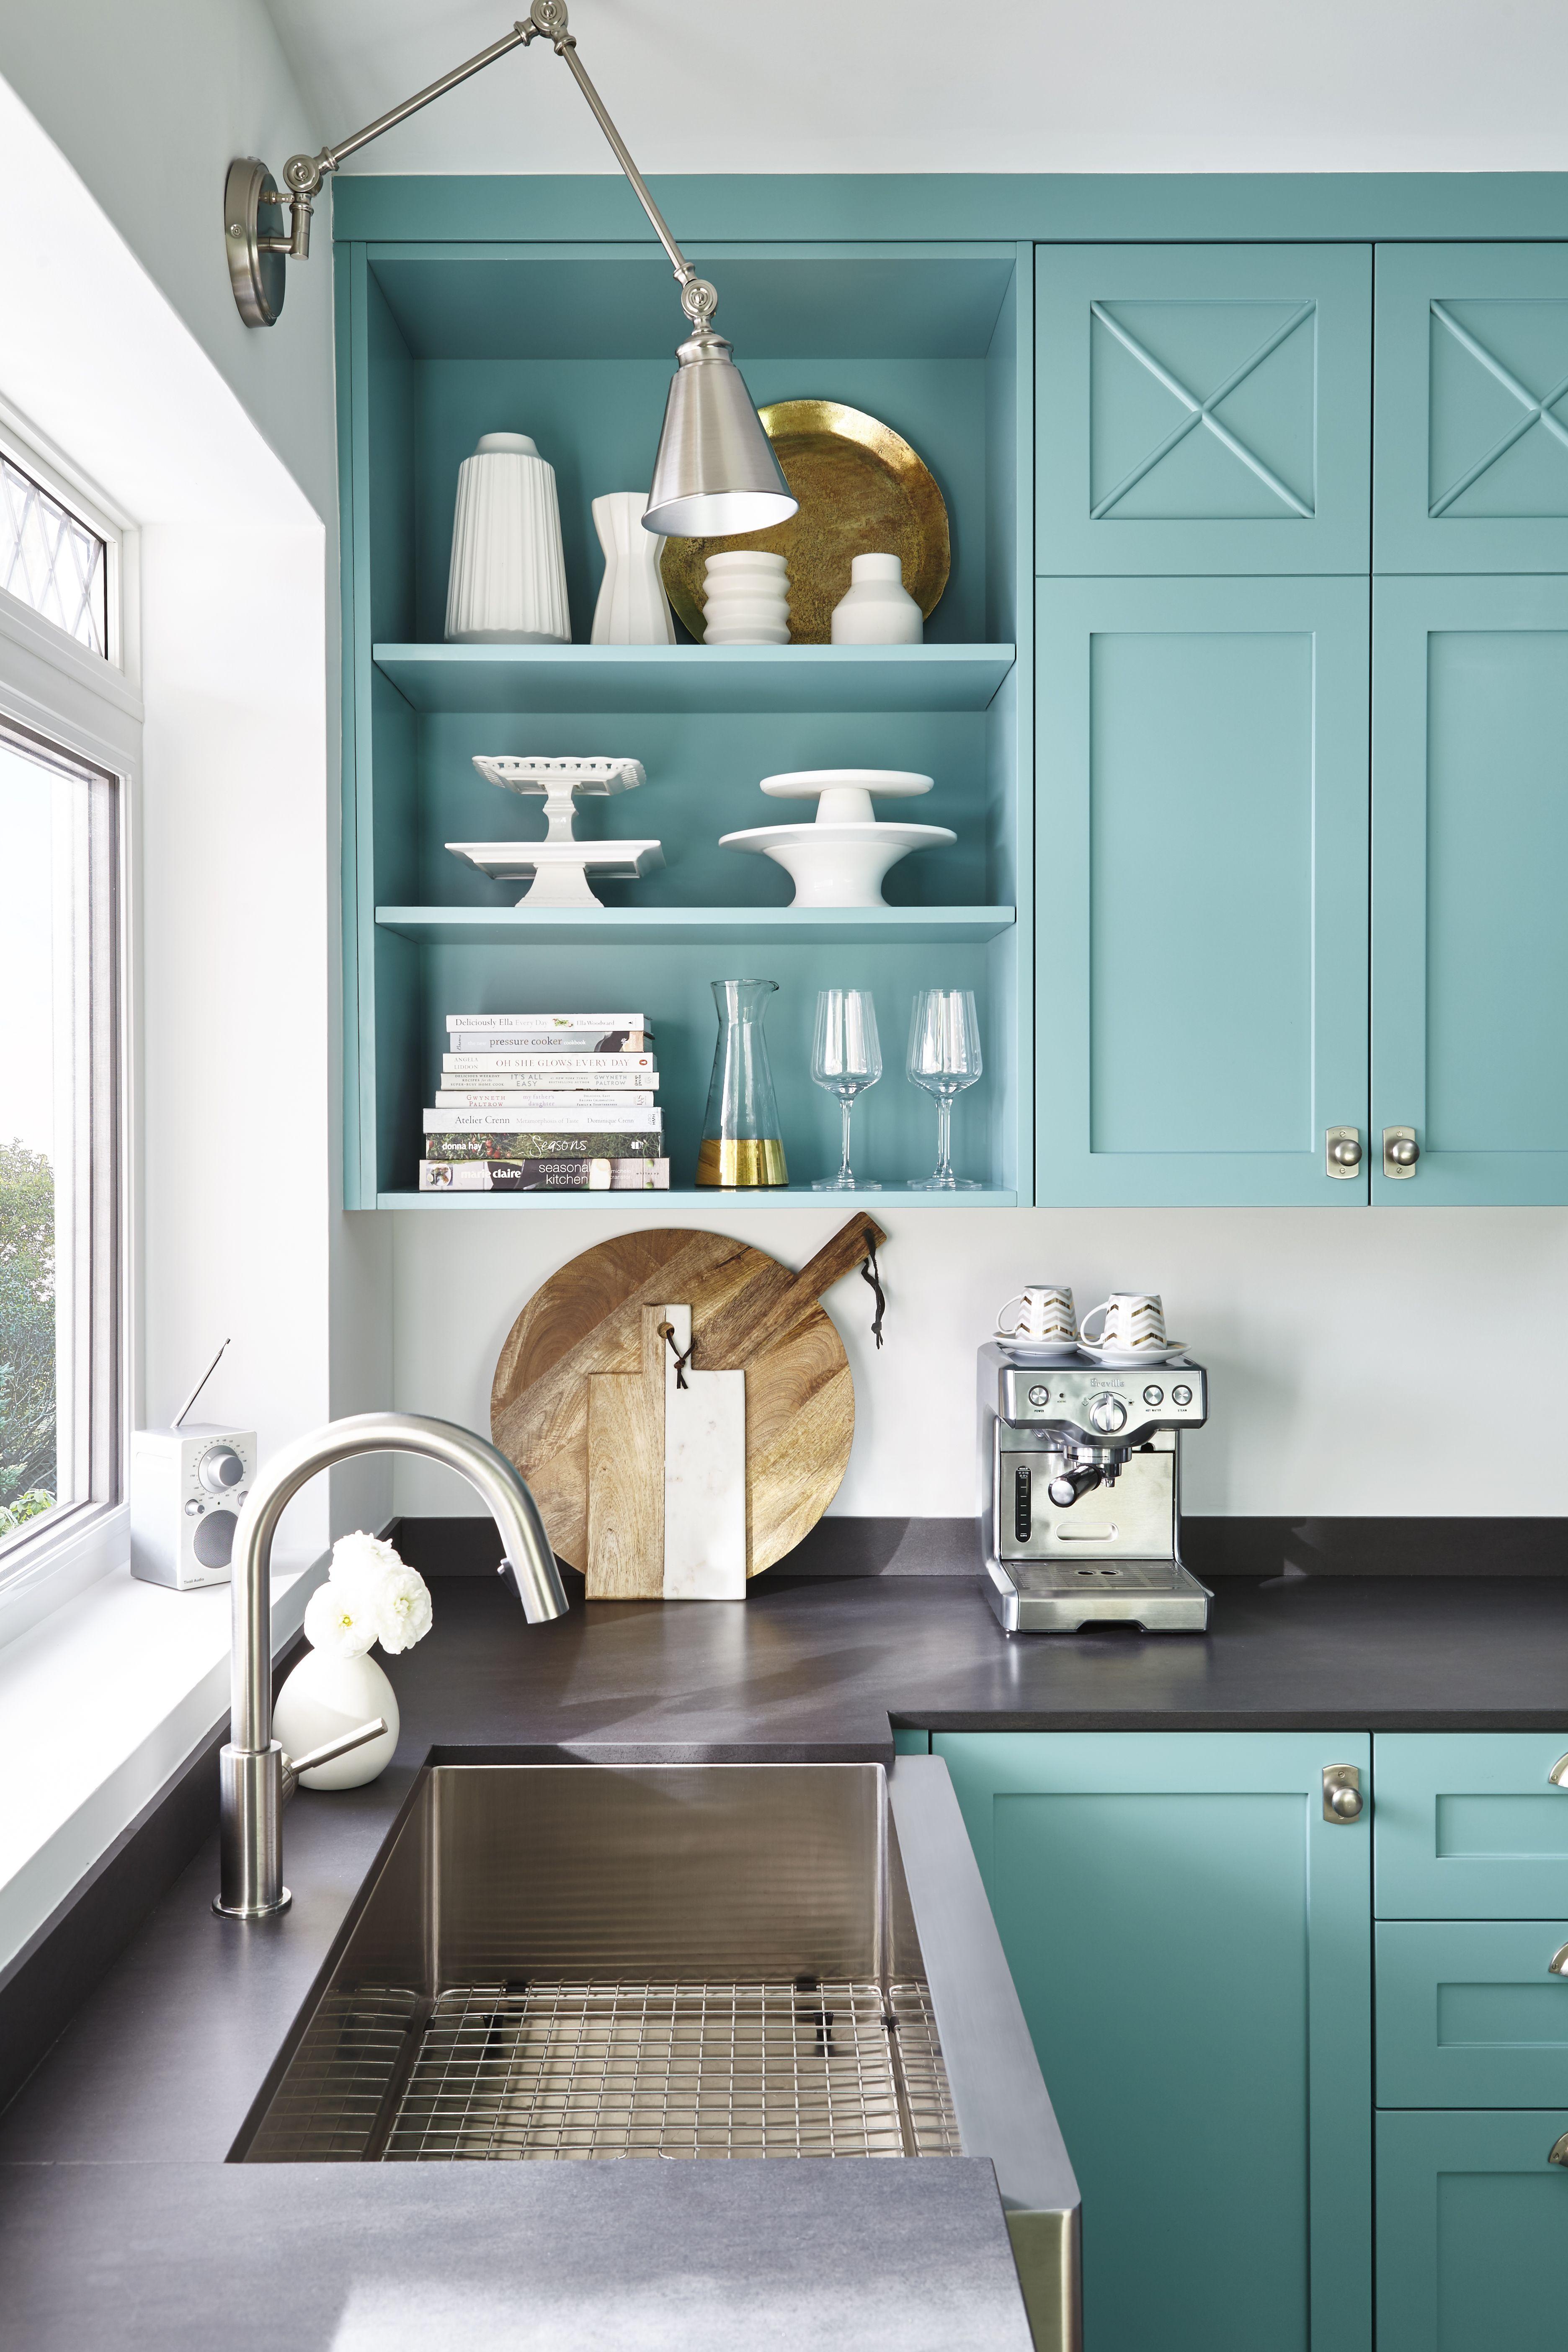 Low window behind kitchen sink  turquoise kitchen  home inspiration  pinterest  turquoise kitchen